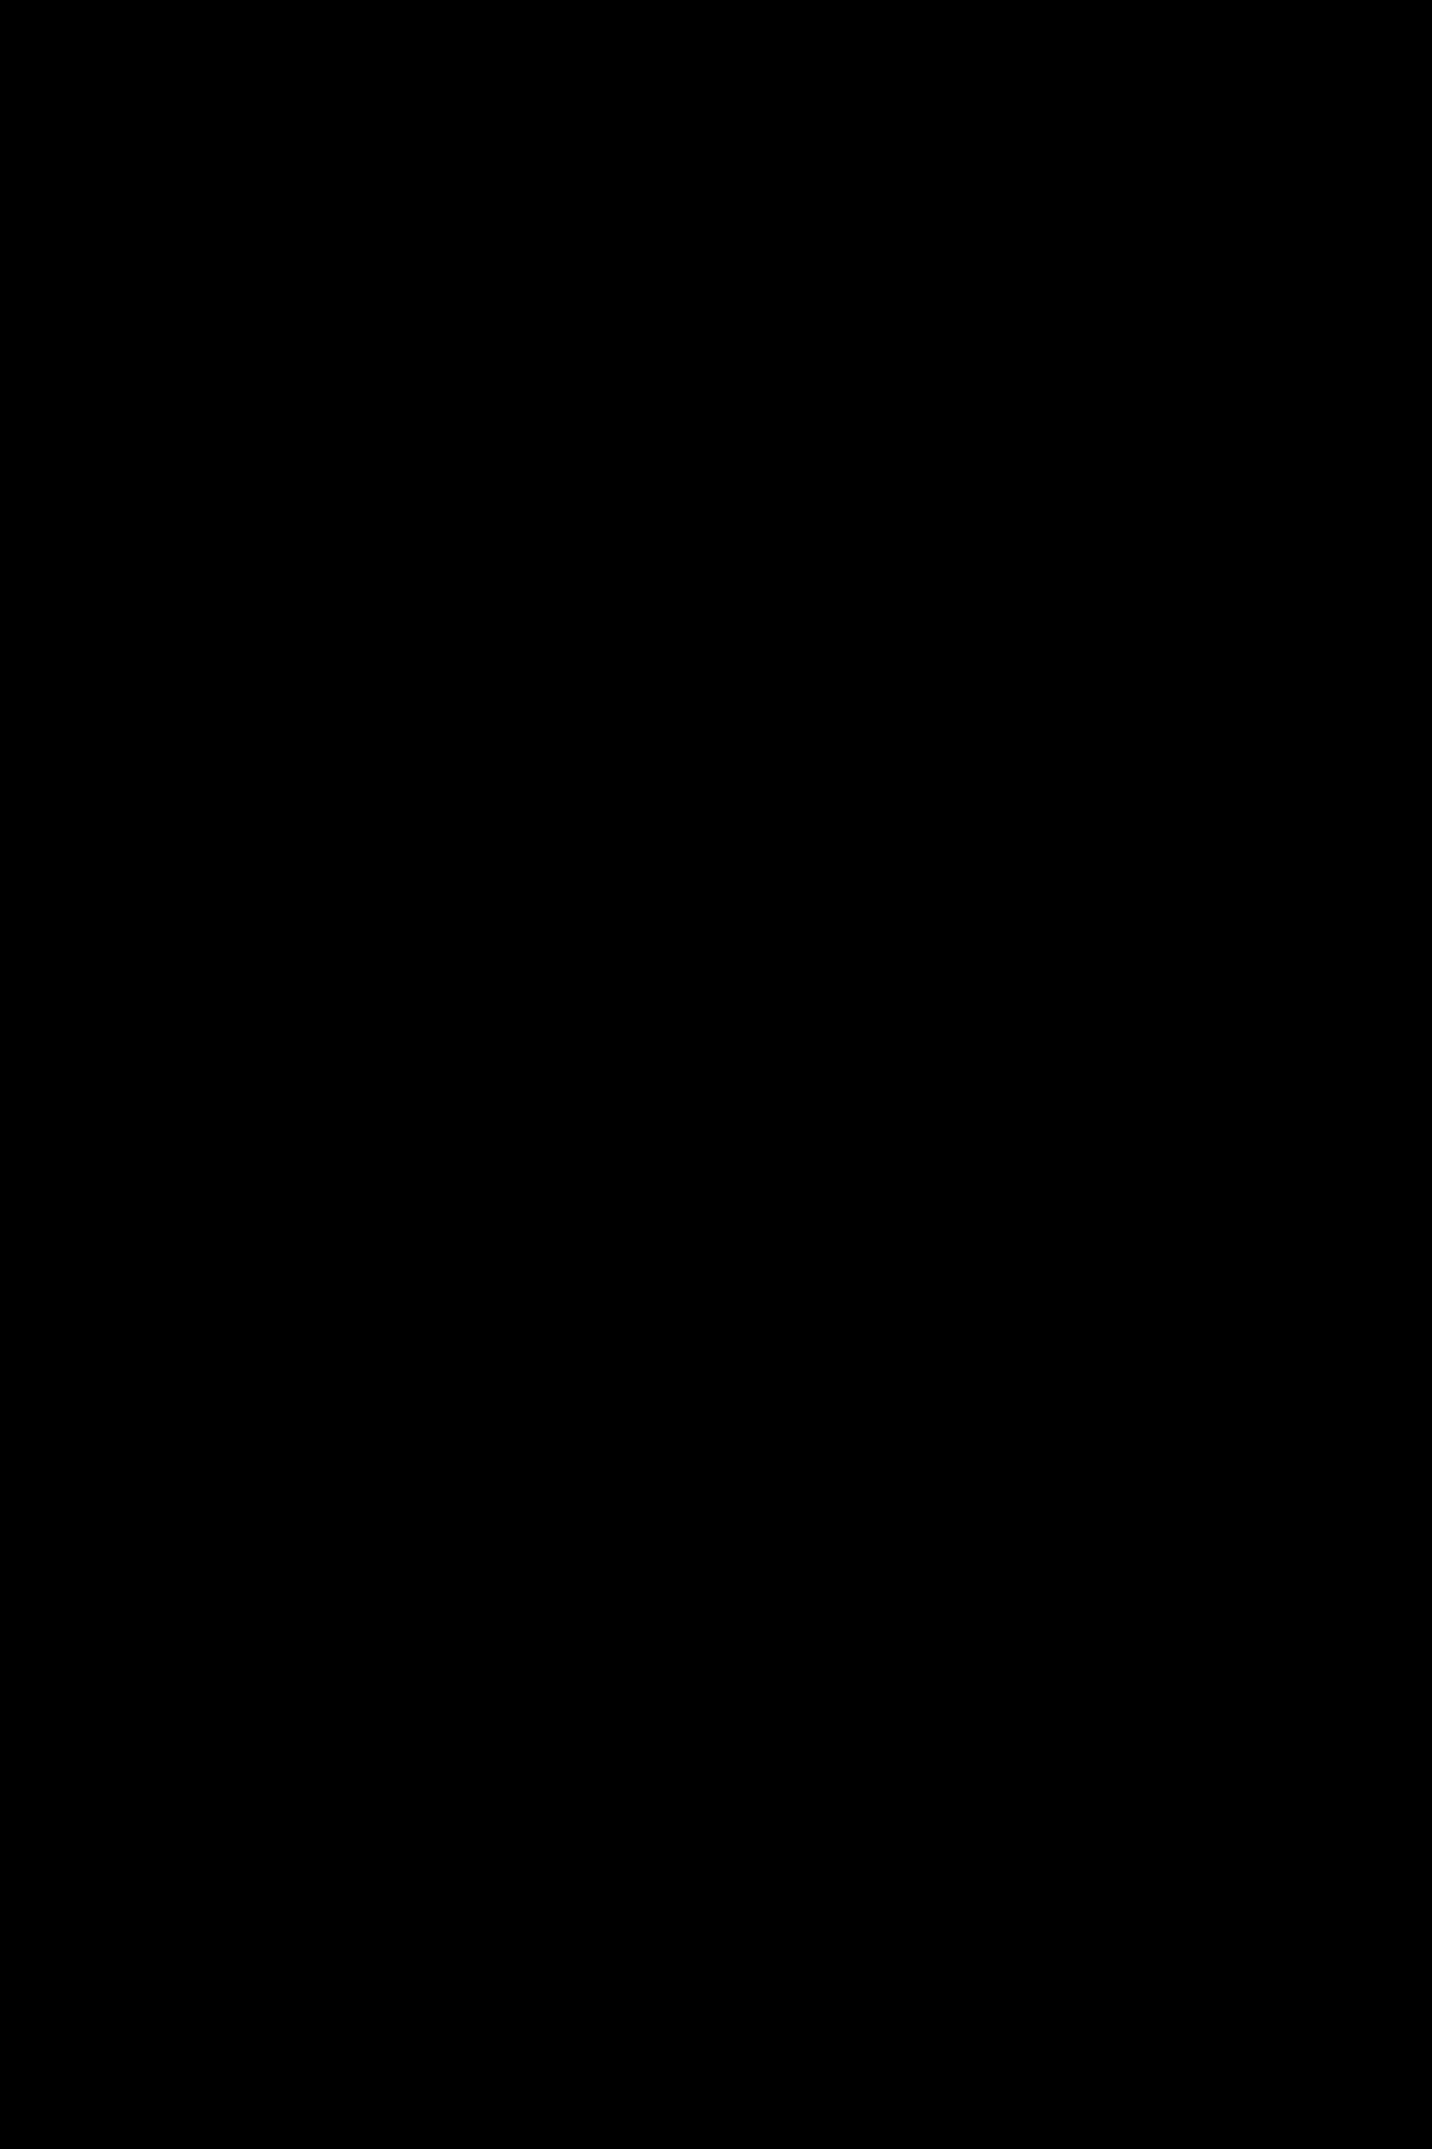 tietar-2×3-2020-06-27